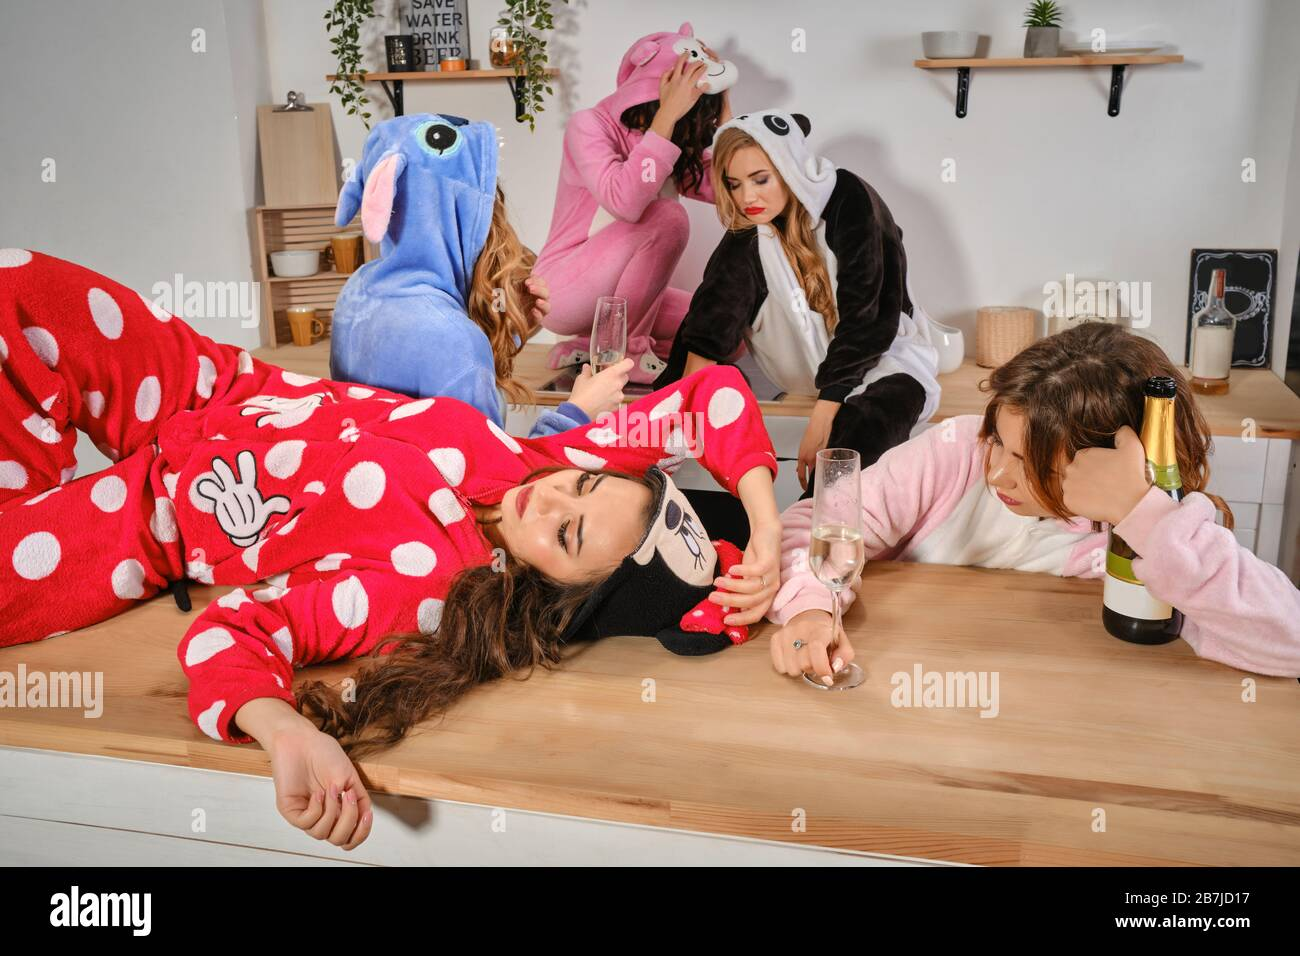 Drunk Girls Immagini E Fotos Stock Alamy